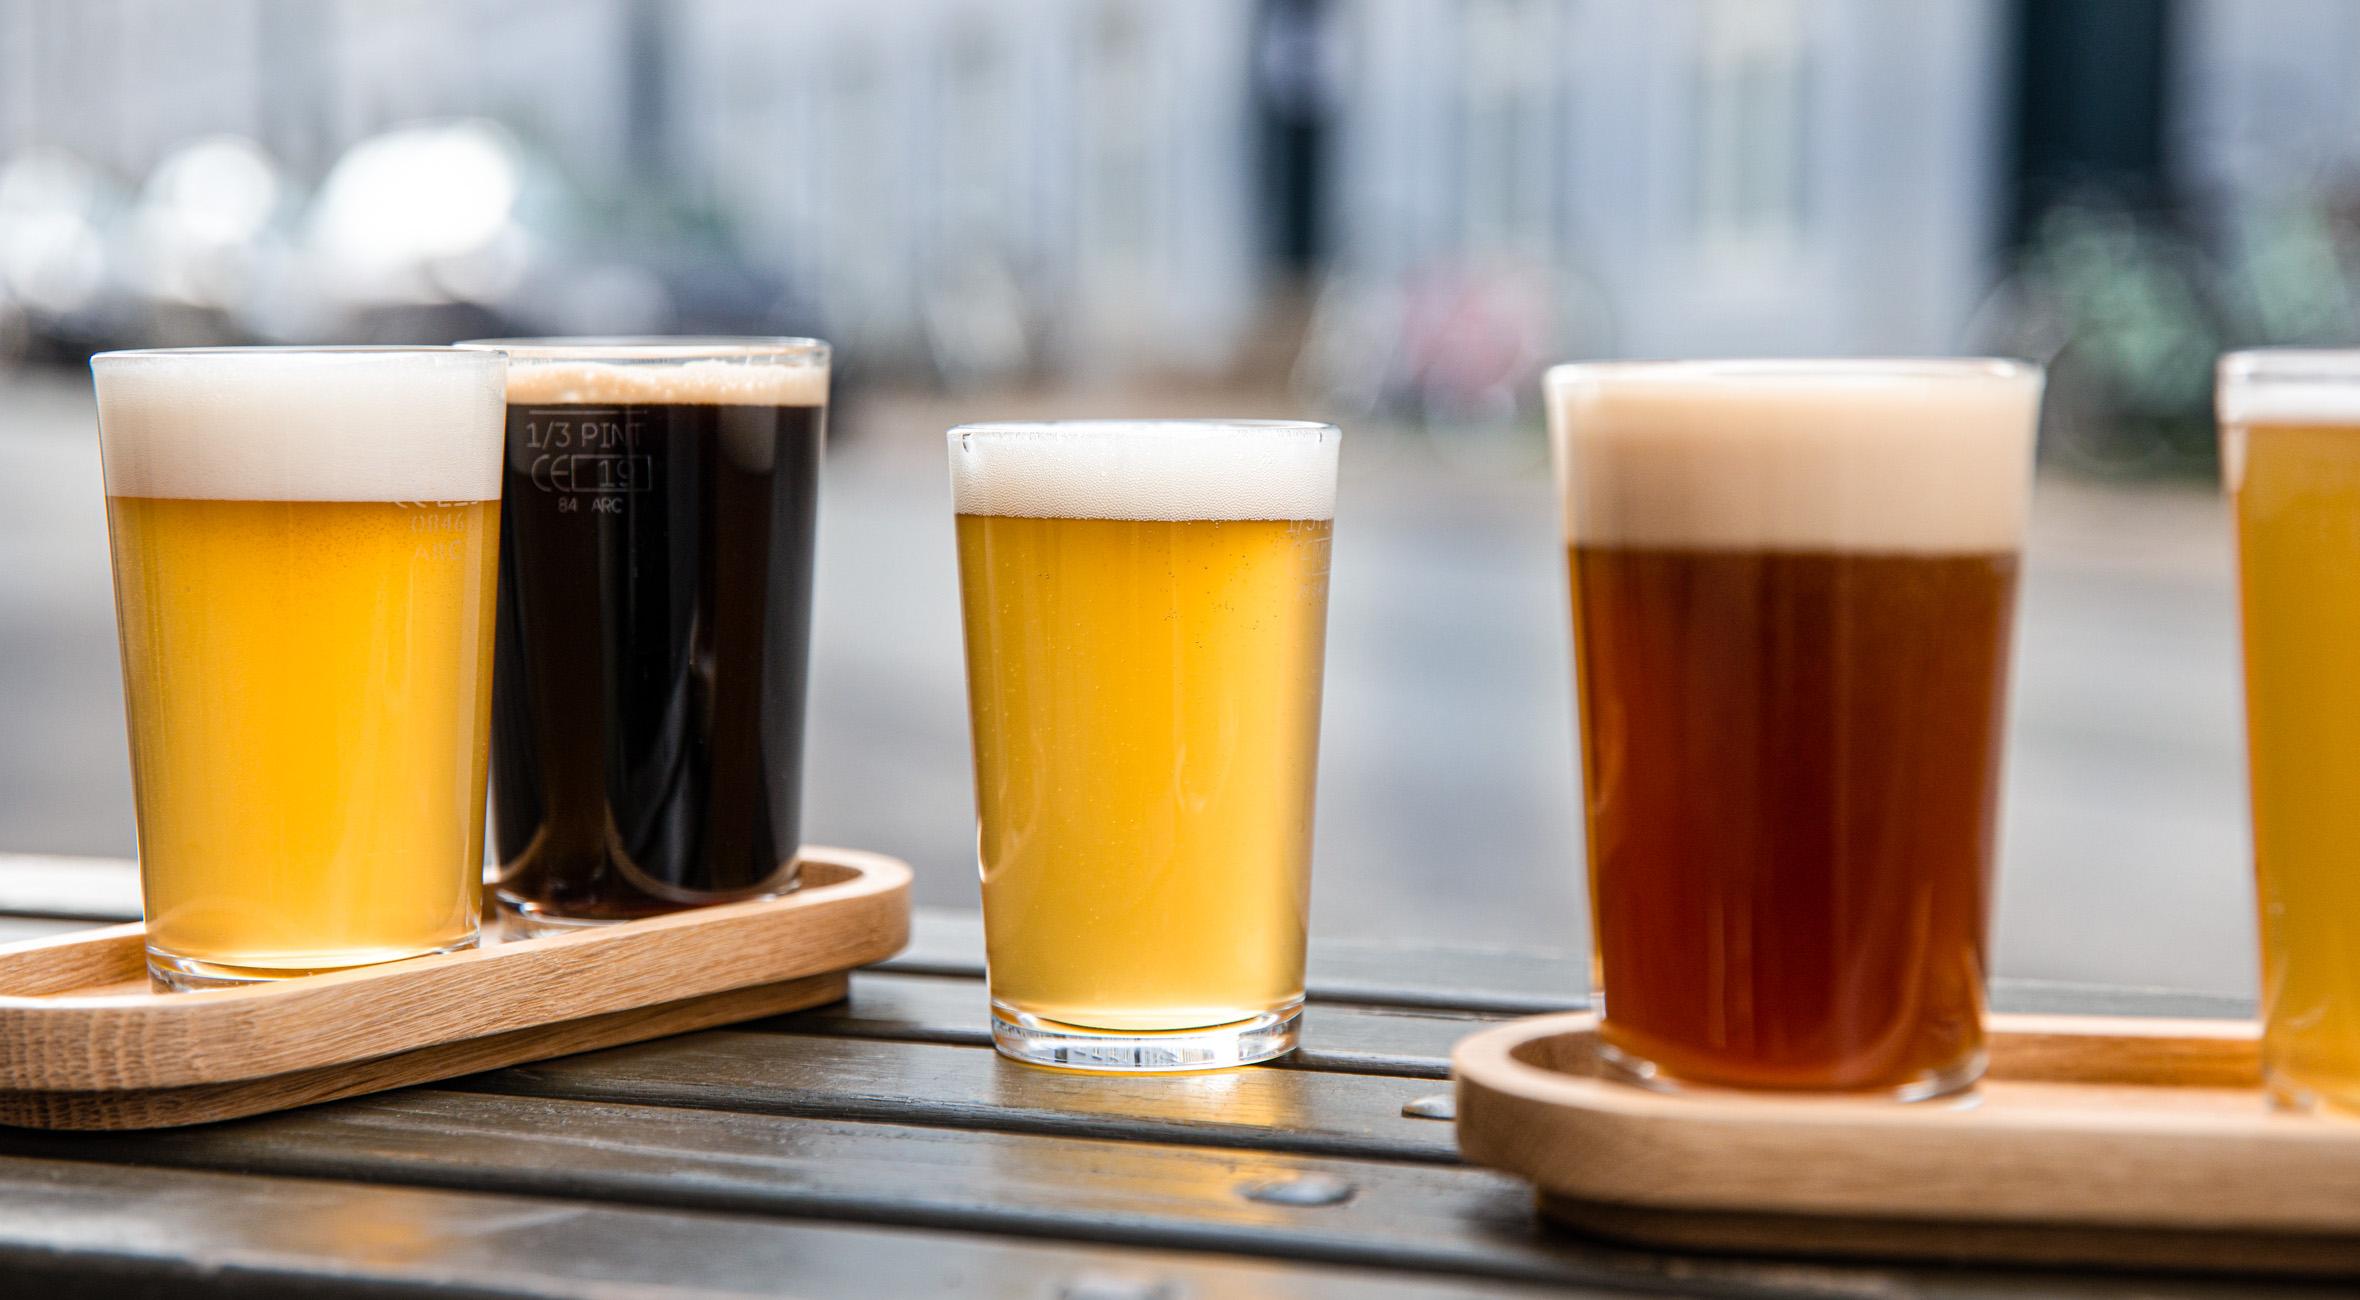 2 beer flights hos Bicycle Brewing på Østerbro – Invitér venner & veninder med på hypet amerikansk-dansk mikrobryggeri